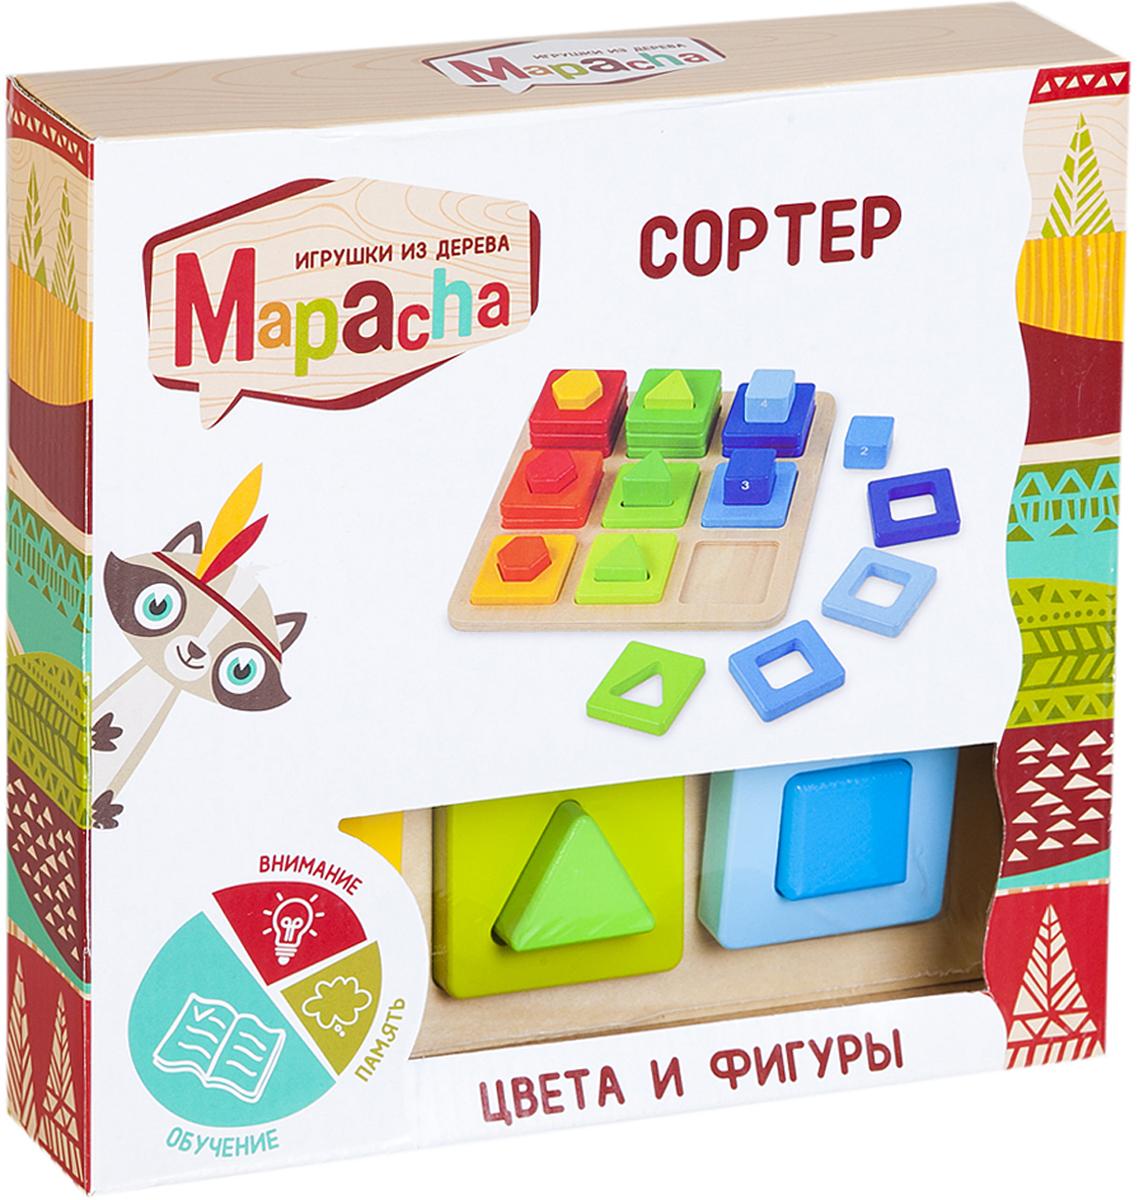 Mapacha Обучающая игра Сортер Цвета и фигуры деревянные игрушки mapacha сортер каталка машинка